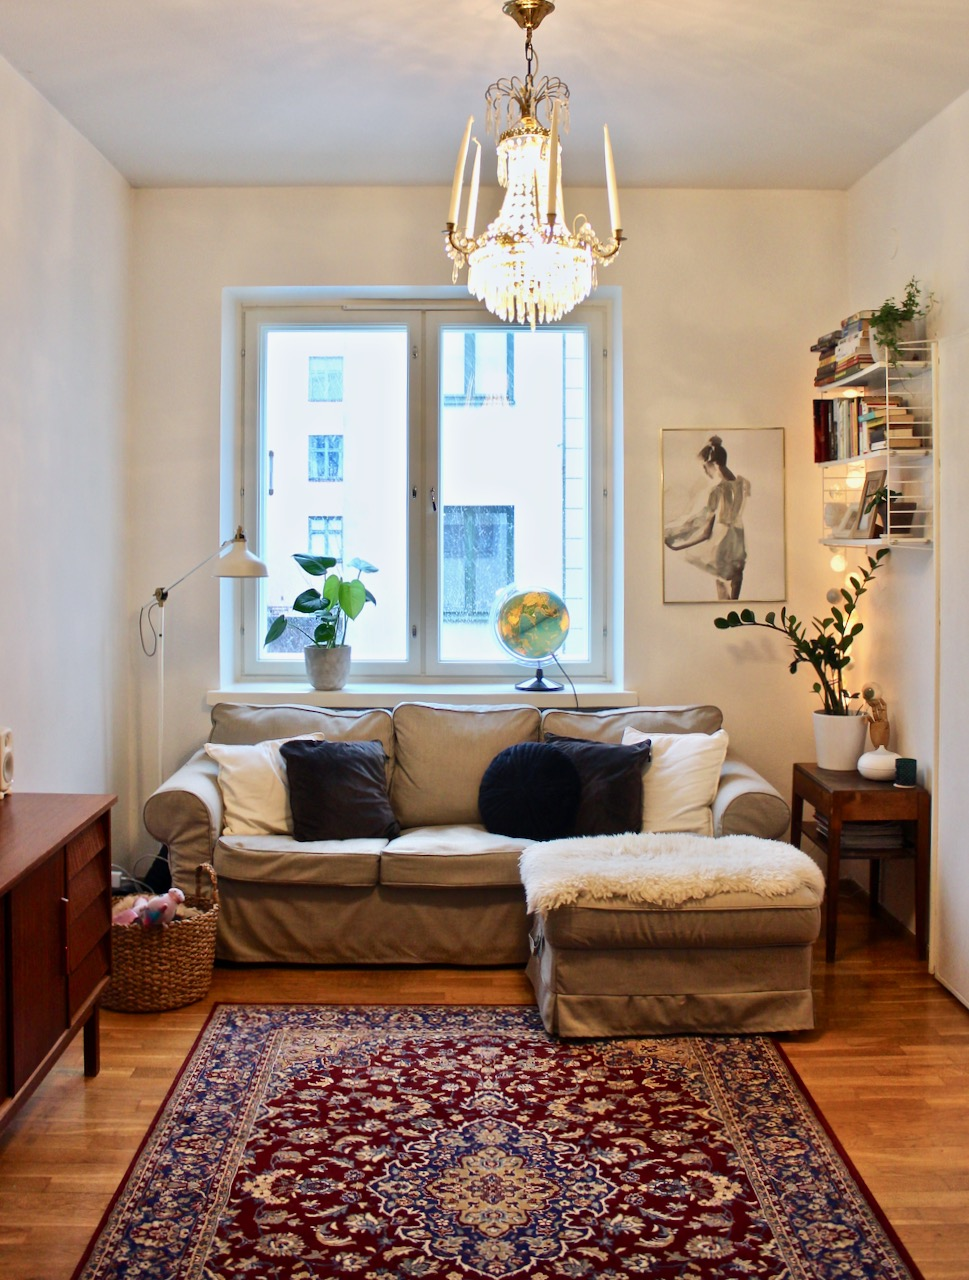 Uudet sohvanpäälliset ja olohuoneen sisustus juuri nyt